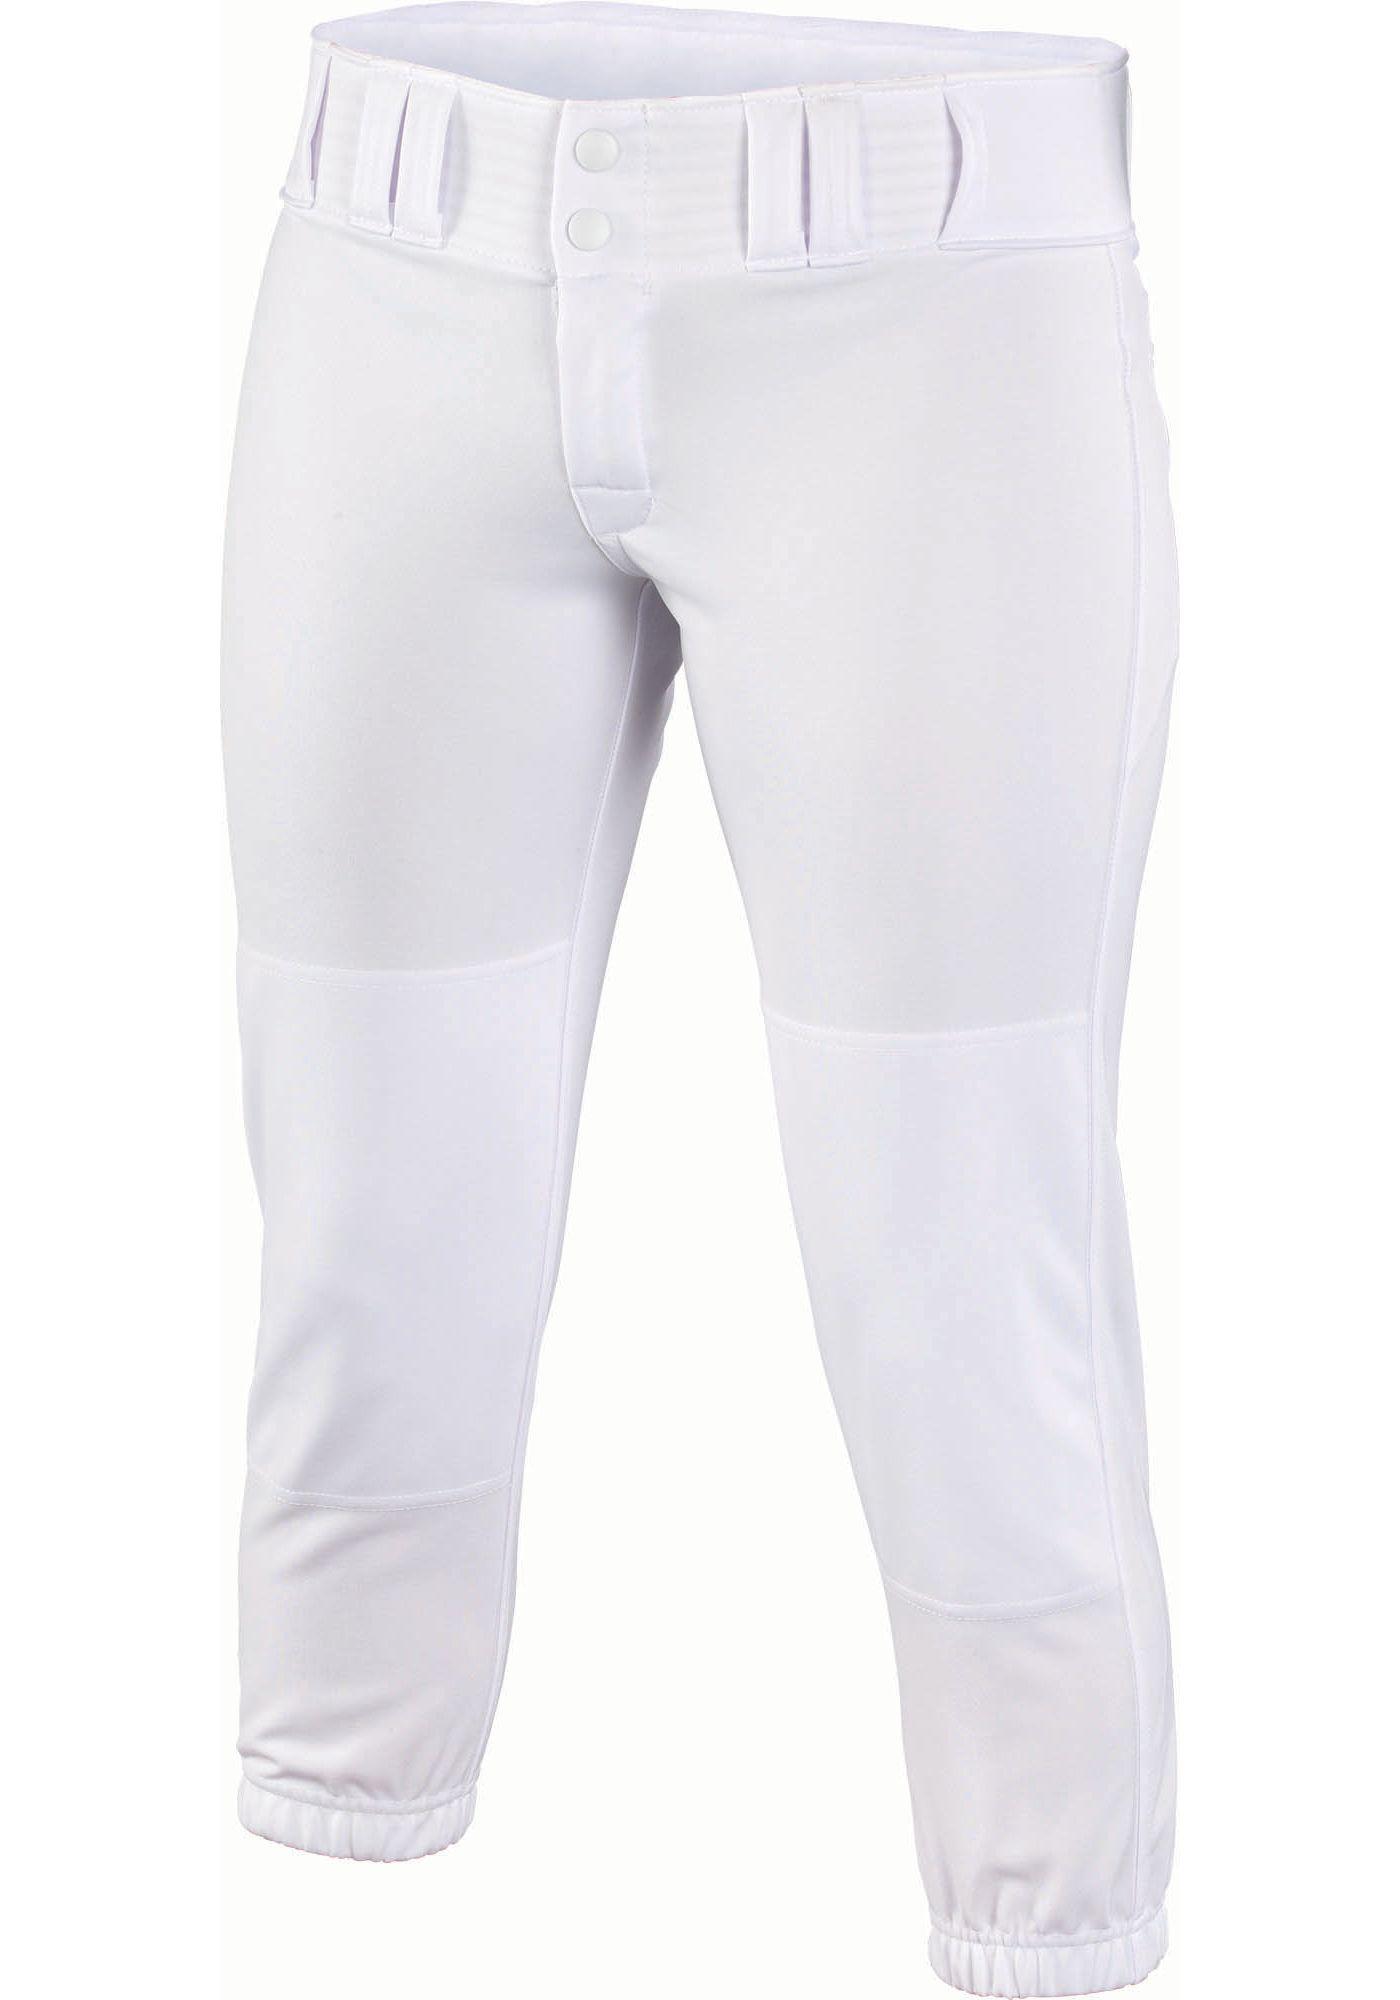 Easton Women's Pro Fastpitch Pants